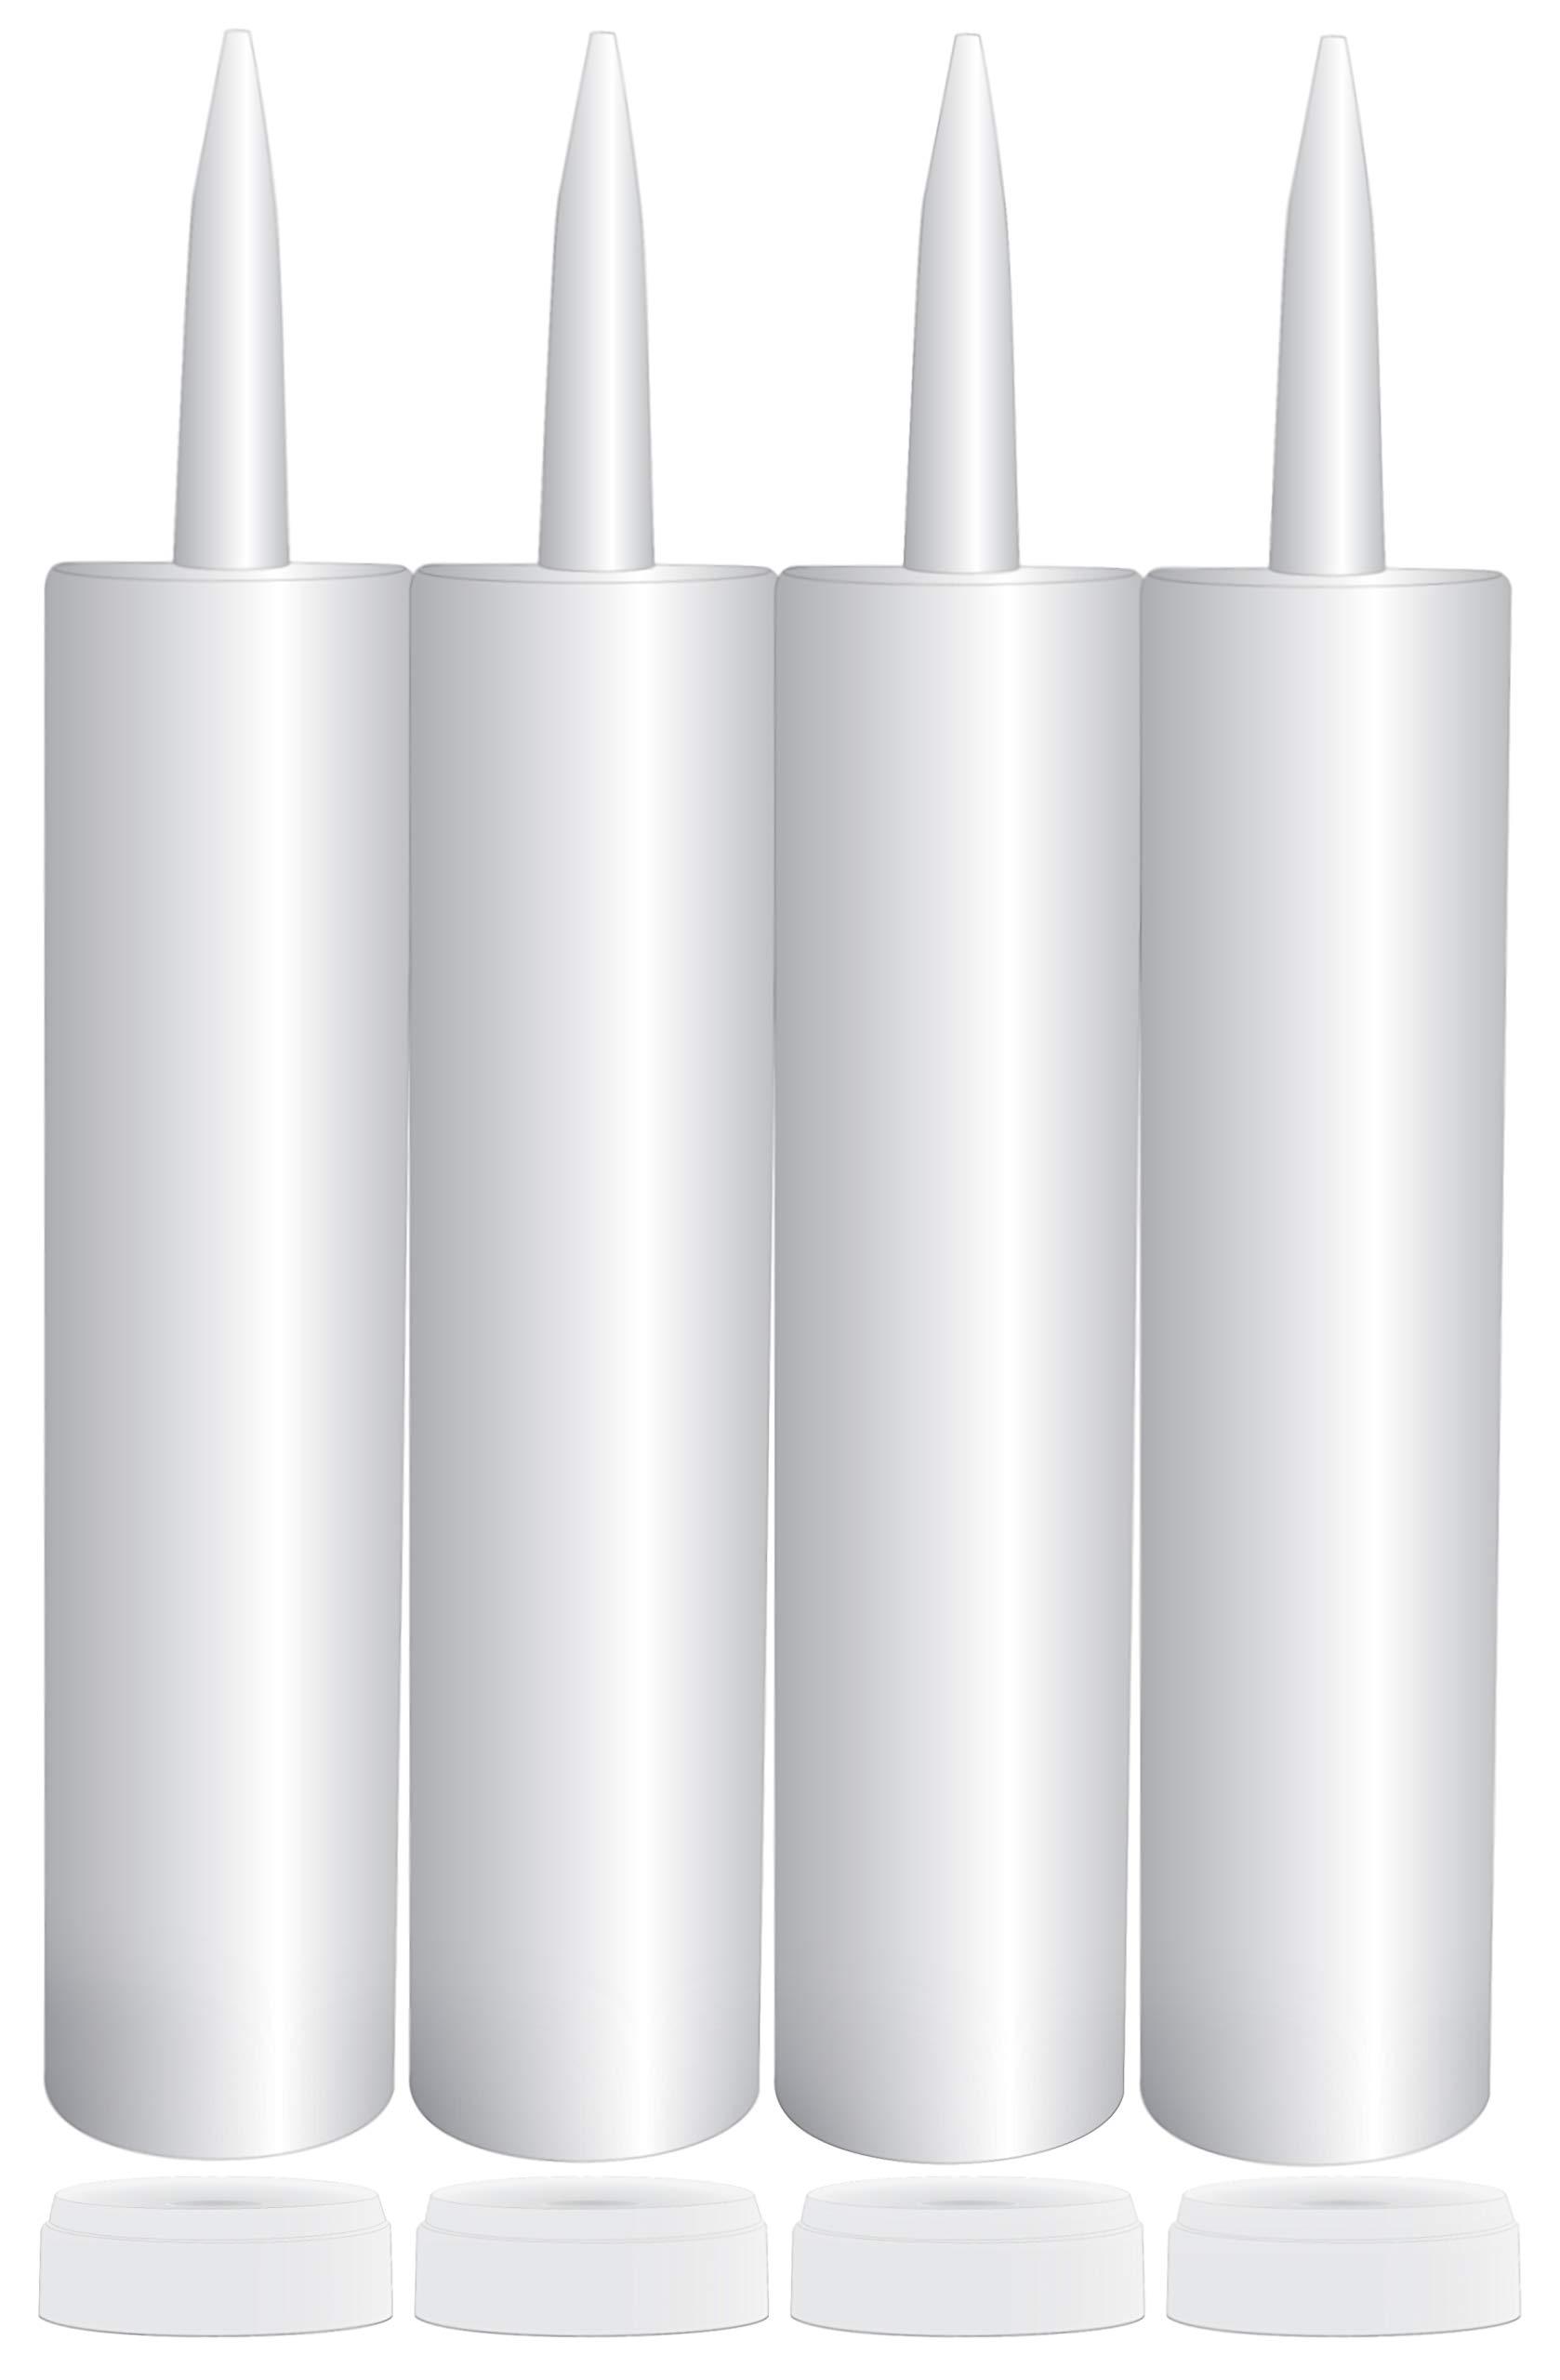 Empty Plastic Caulk Tubes, 11-Ounce (4-Pack); Refillable Sealant Caulking Tubes by Cornucopia Brands